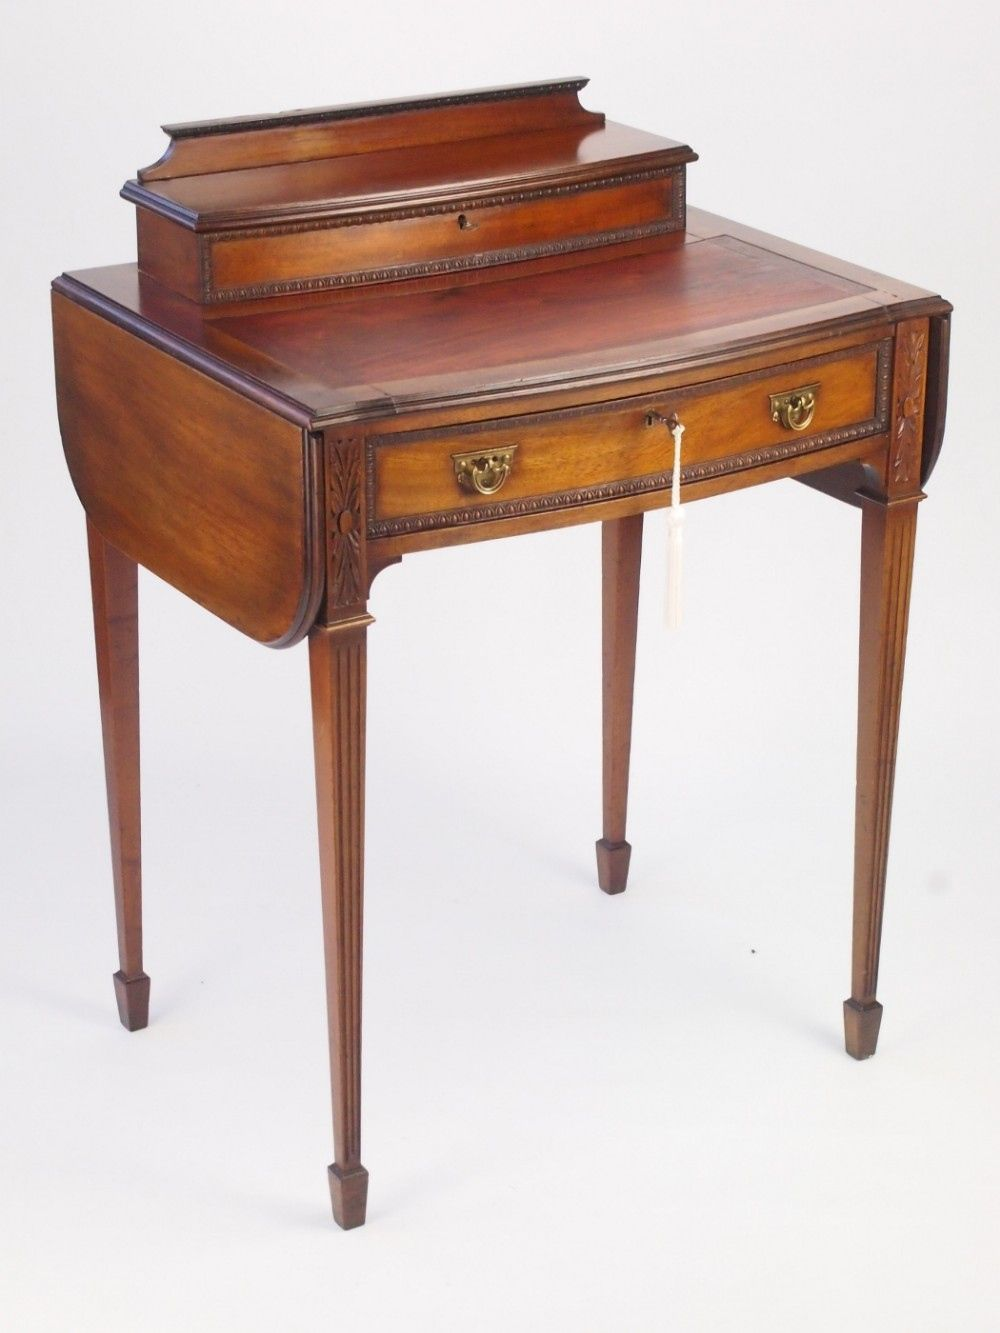 Antique Small Desk Desk Design Ideas Check More At Http Www Gameintown Com Antique Small Desk Mahogany Desk Cool Office Desk Writing Desk Design